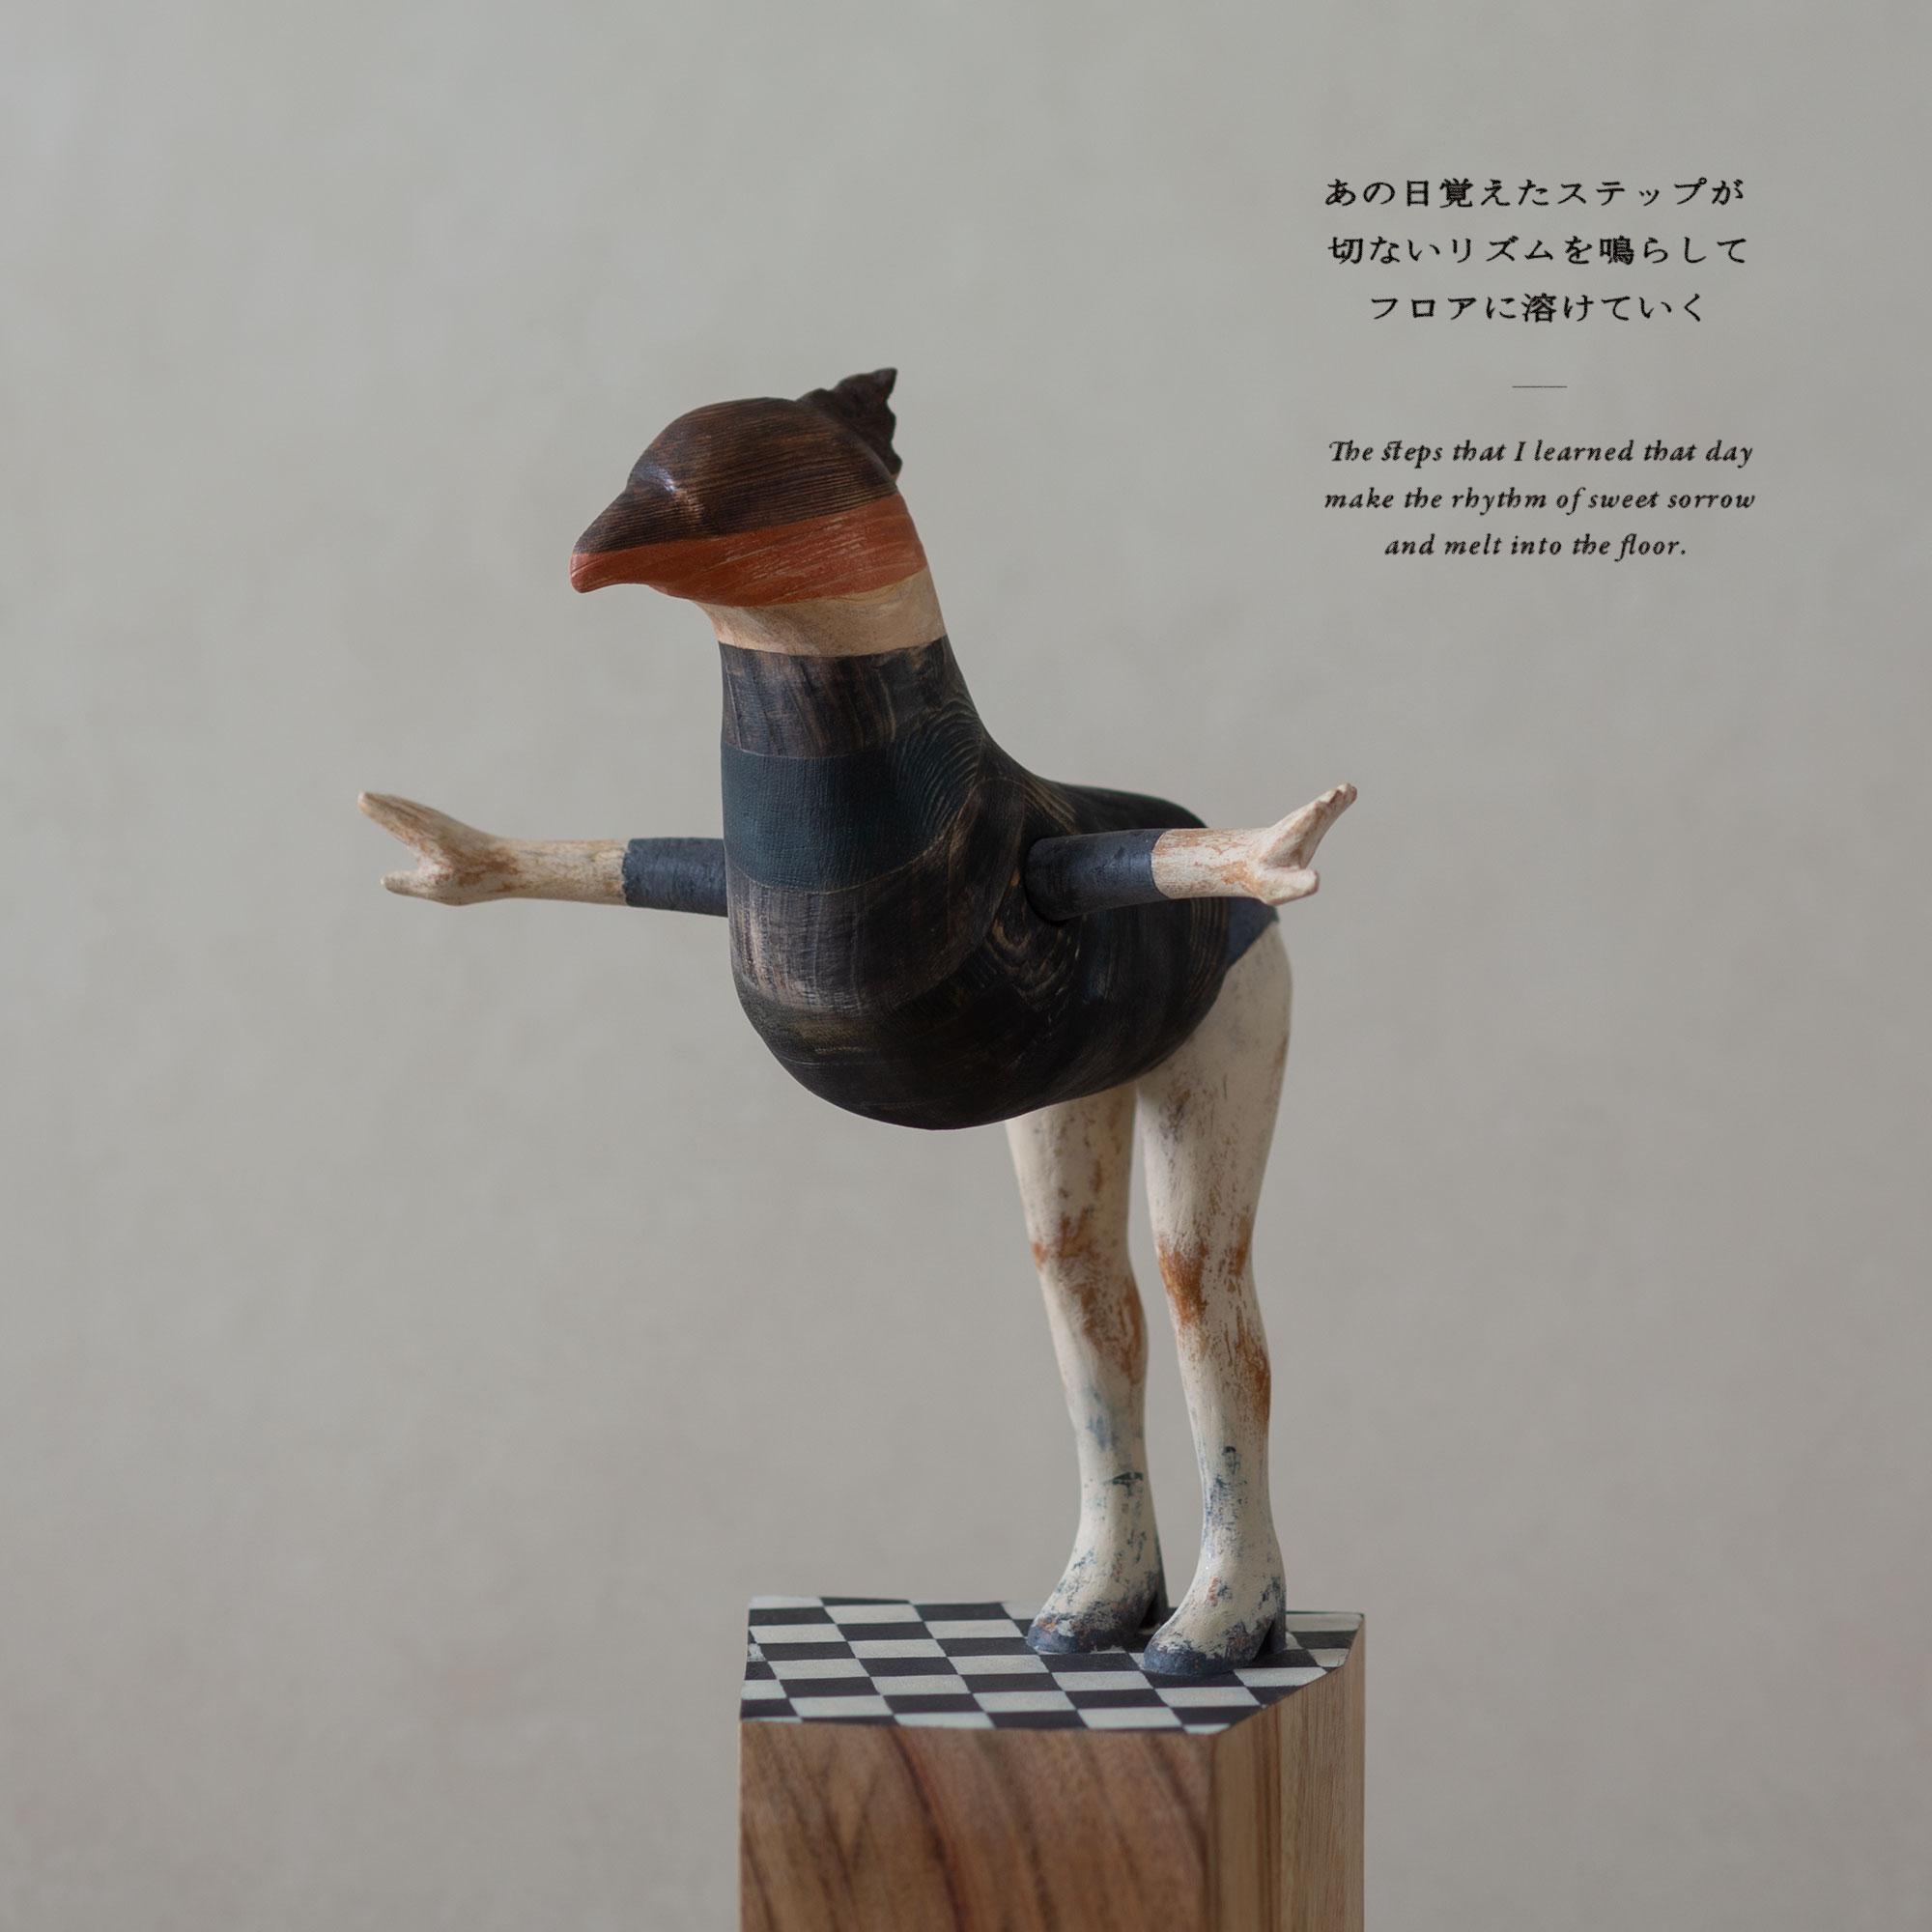 "Yuta NISHIURA ""動 Motion"" #06 Jun. 2020 「あの日覚えたステップが 切ないリズムを鳴らしてフロアに溶けていく」"